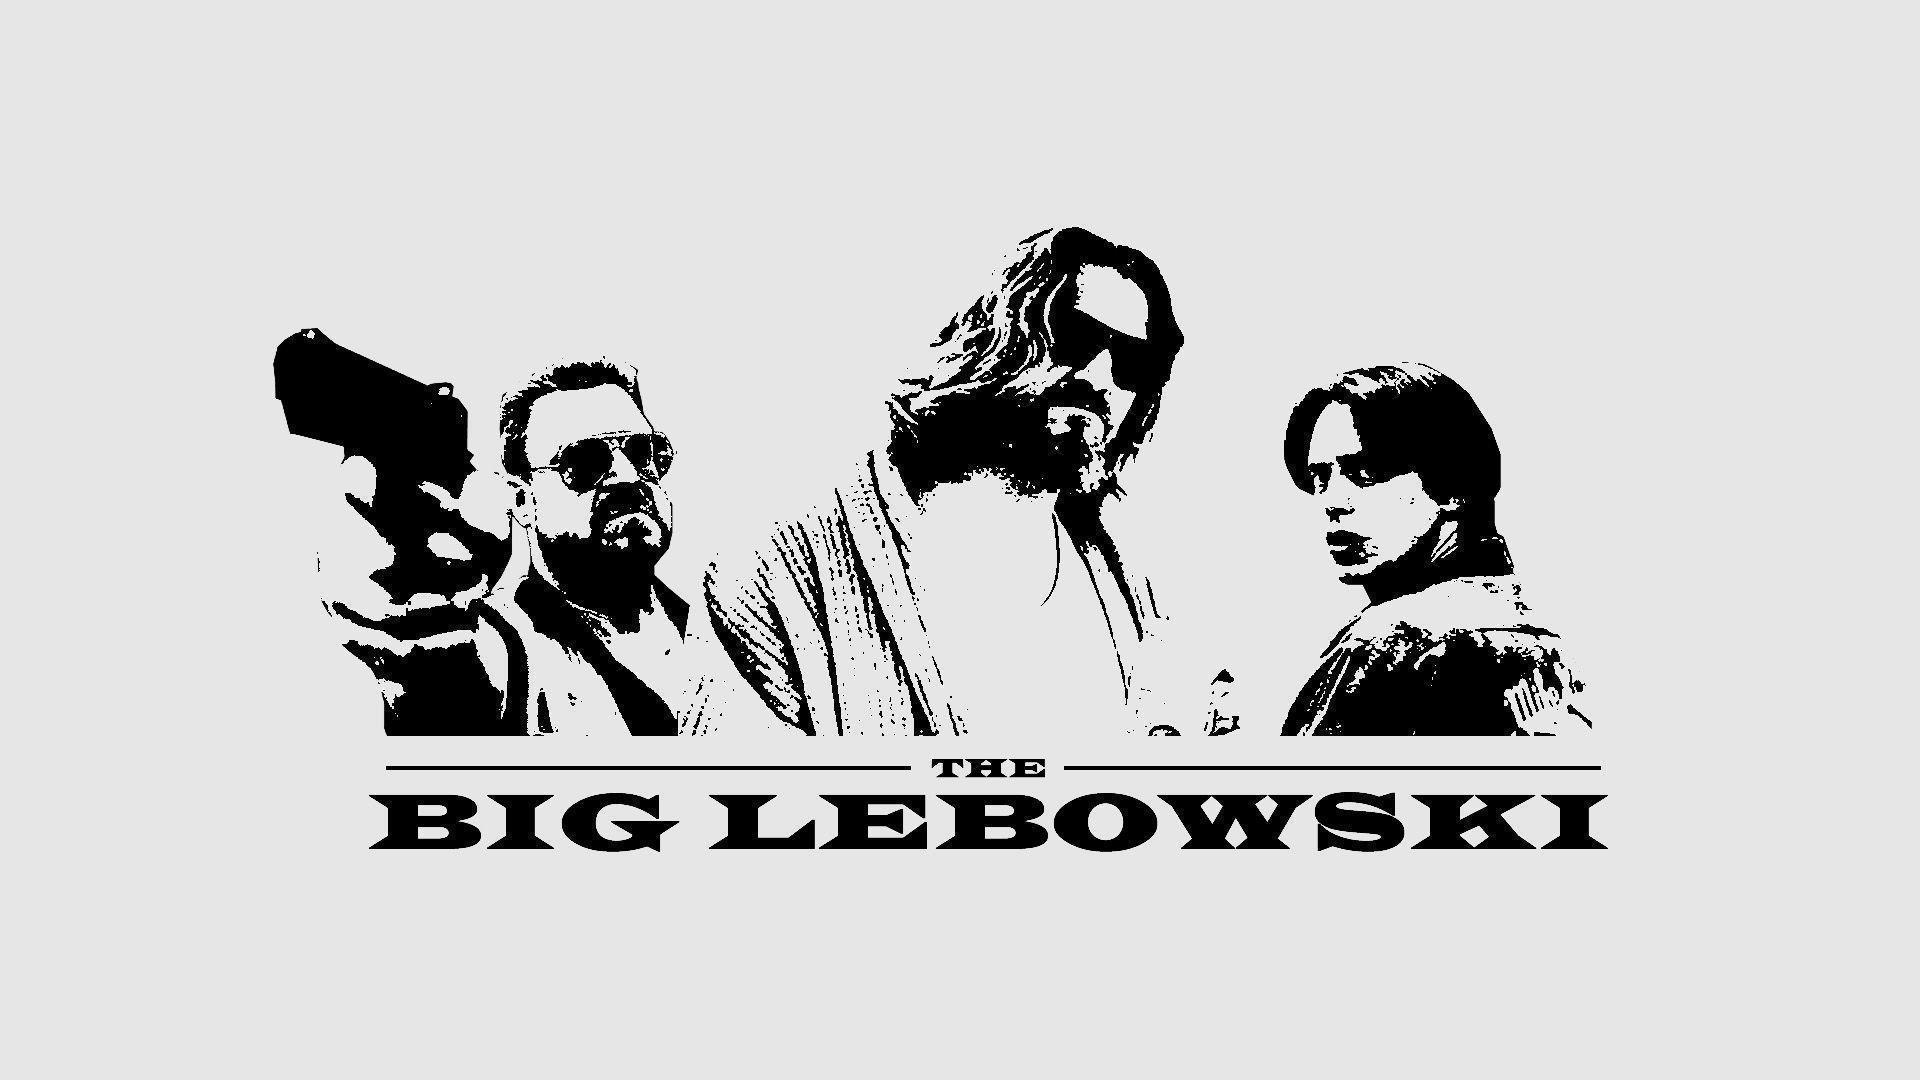 The Big Lebowski Wallpapers - Wallpaper Cave